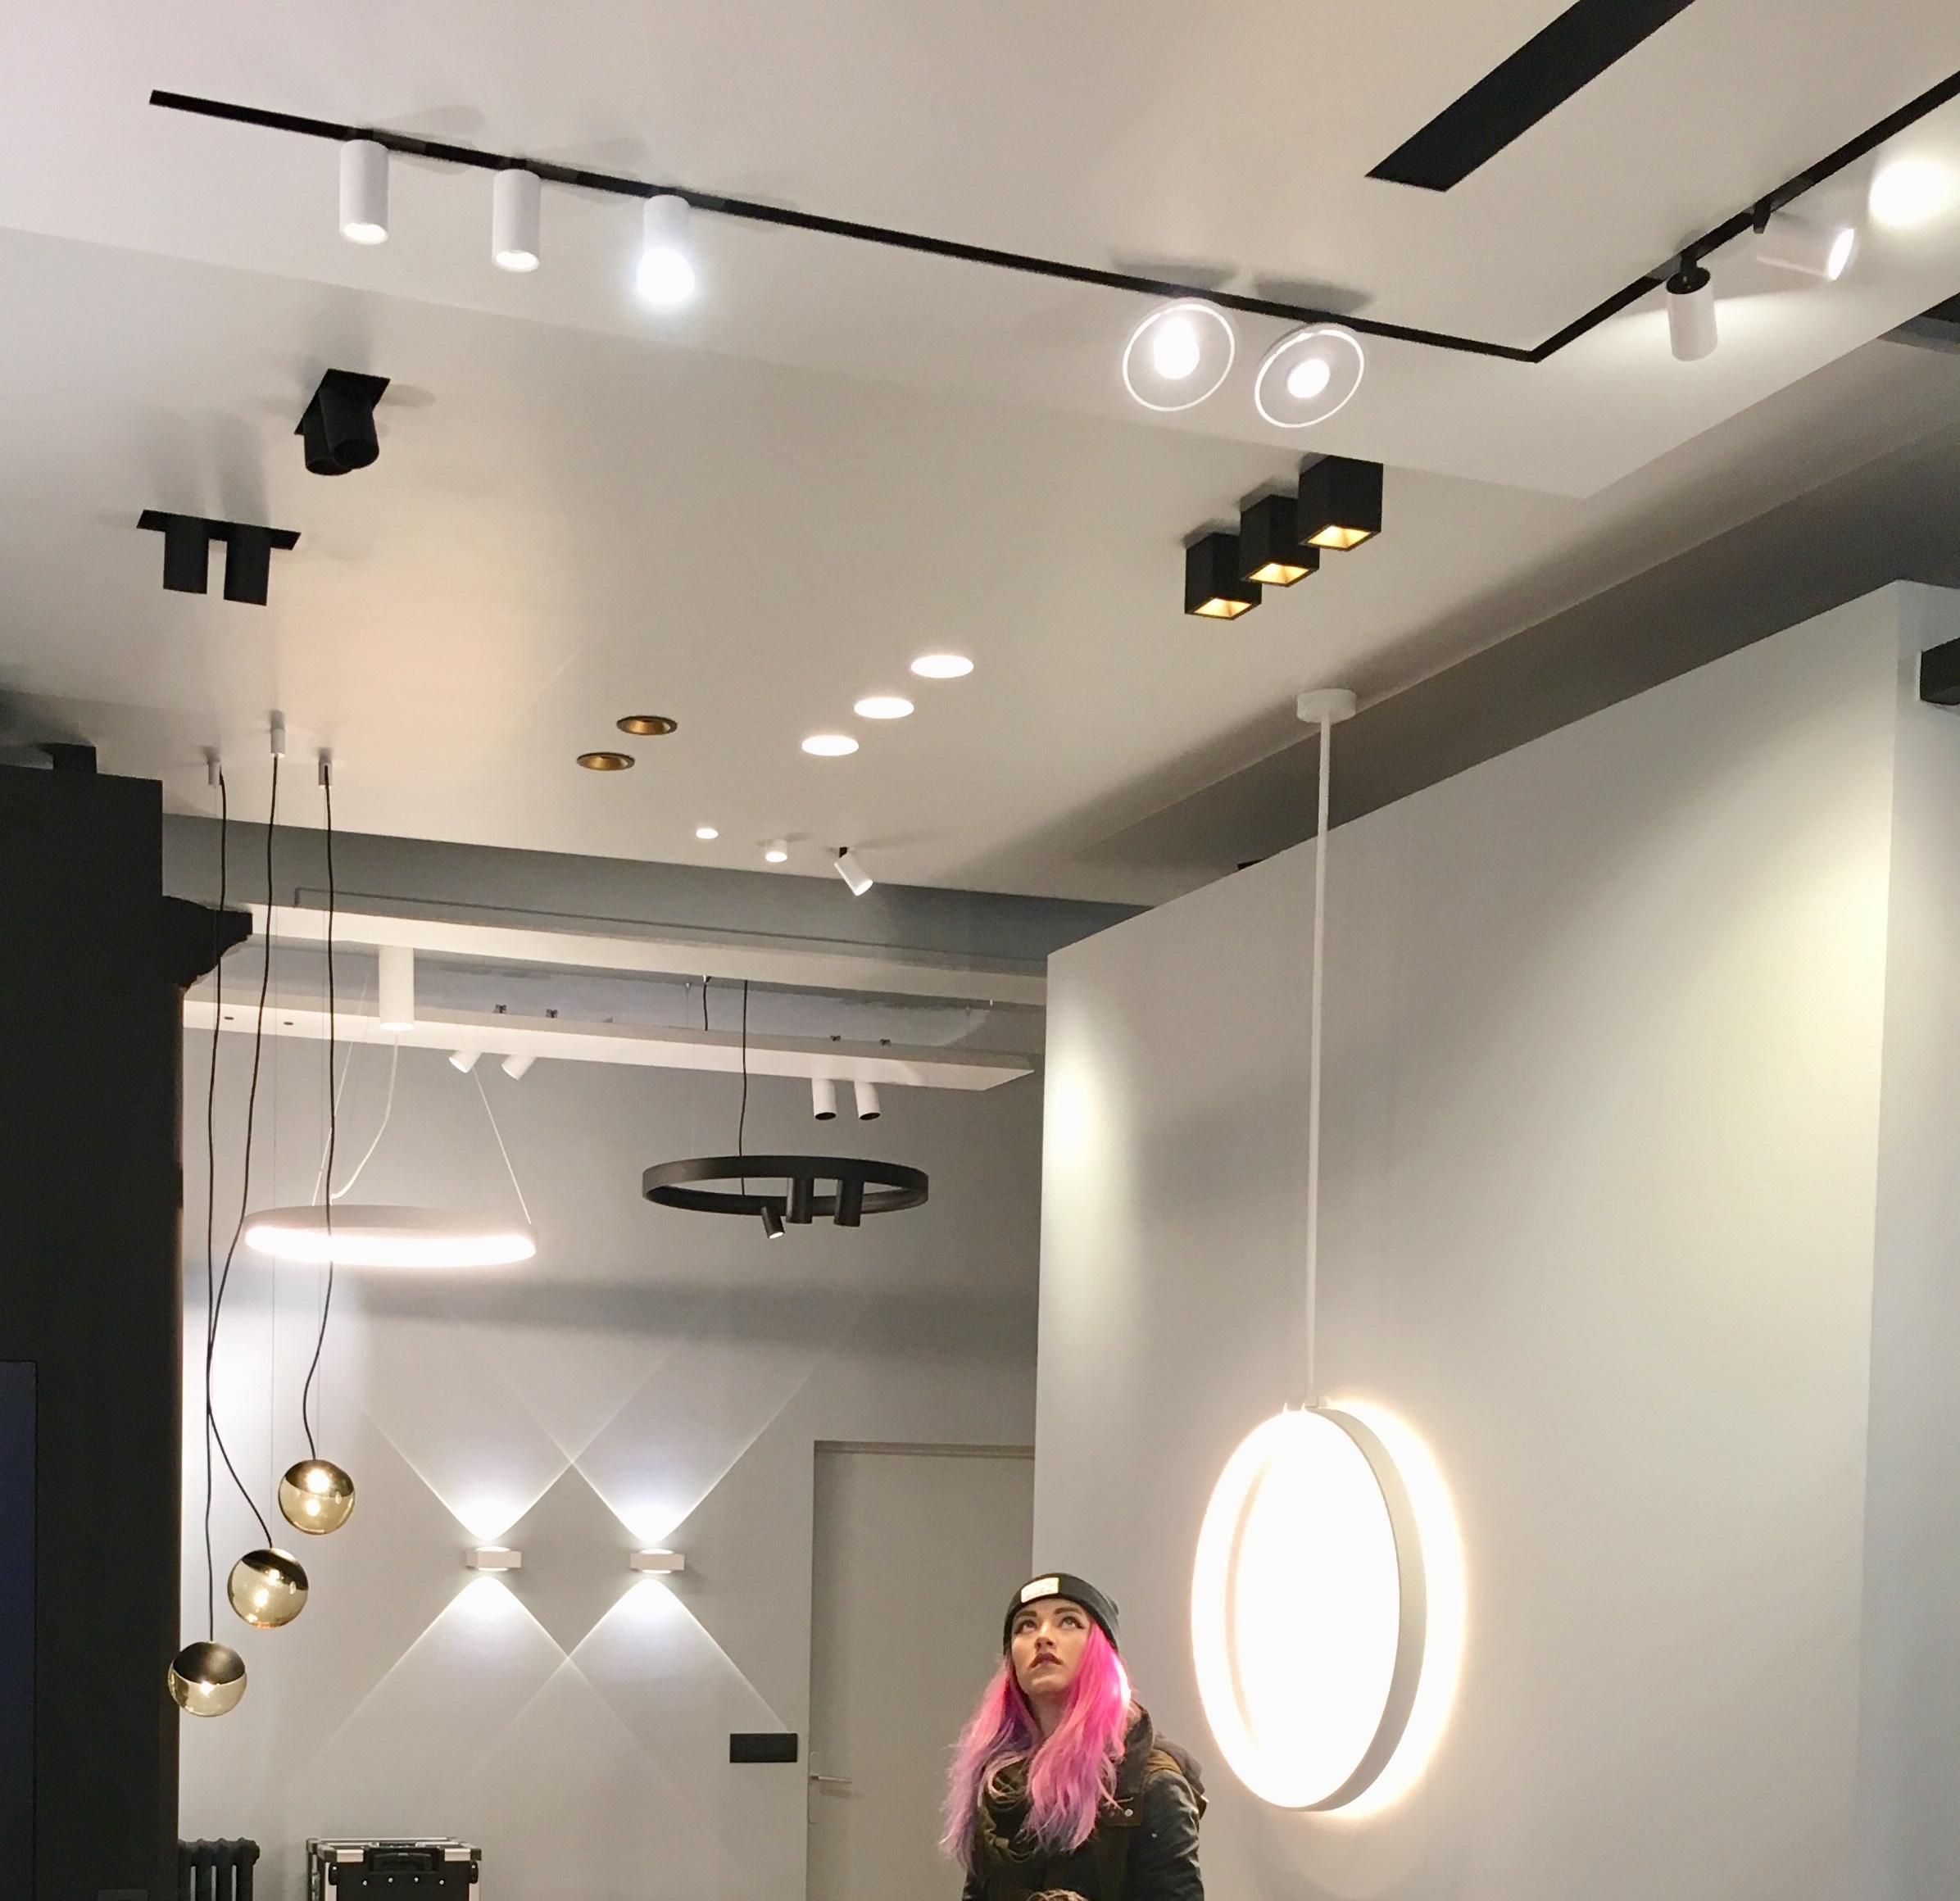 Interior design students visit belgian lighting specialist for Interior design lighting specialist